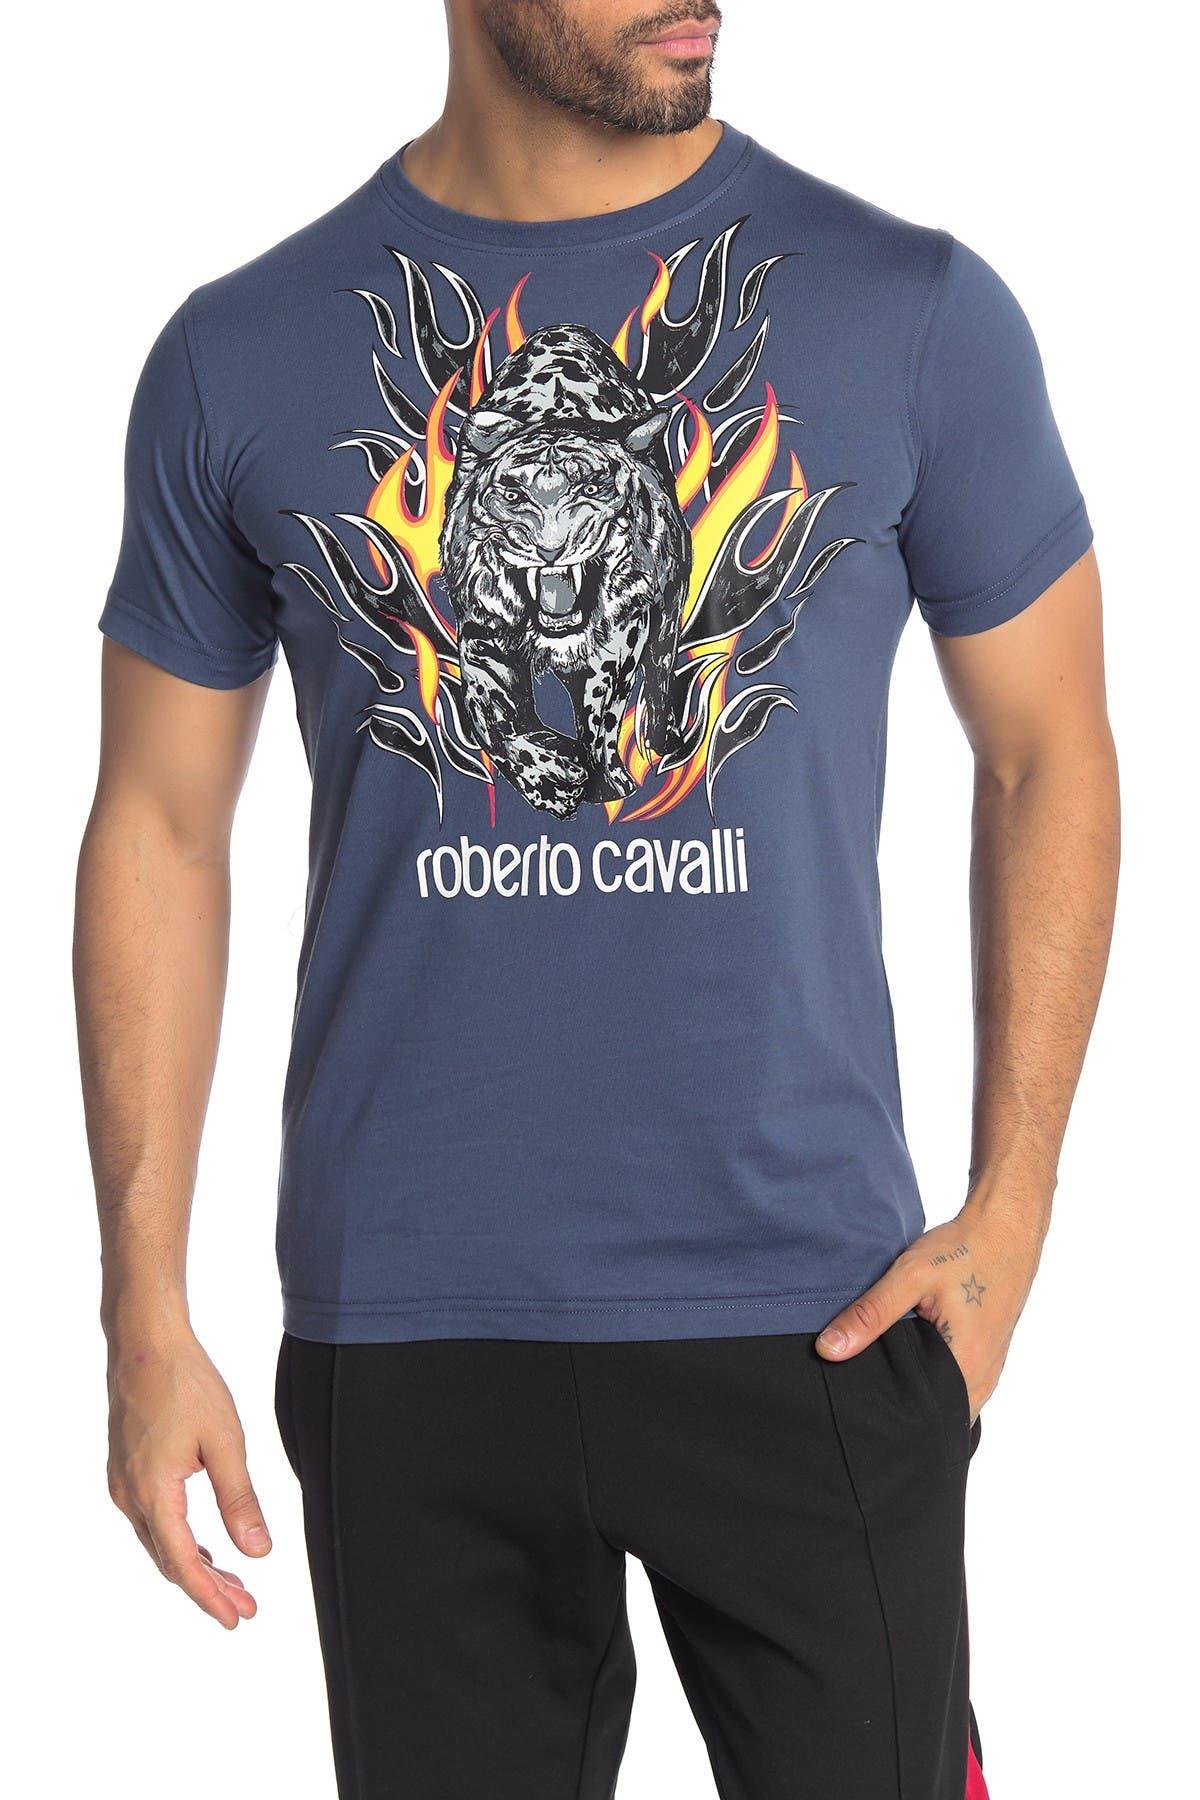 Roberto Cavalli Leopard Front Graphic Short Sleeve T-Shirt